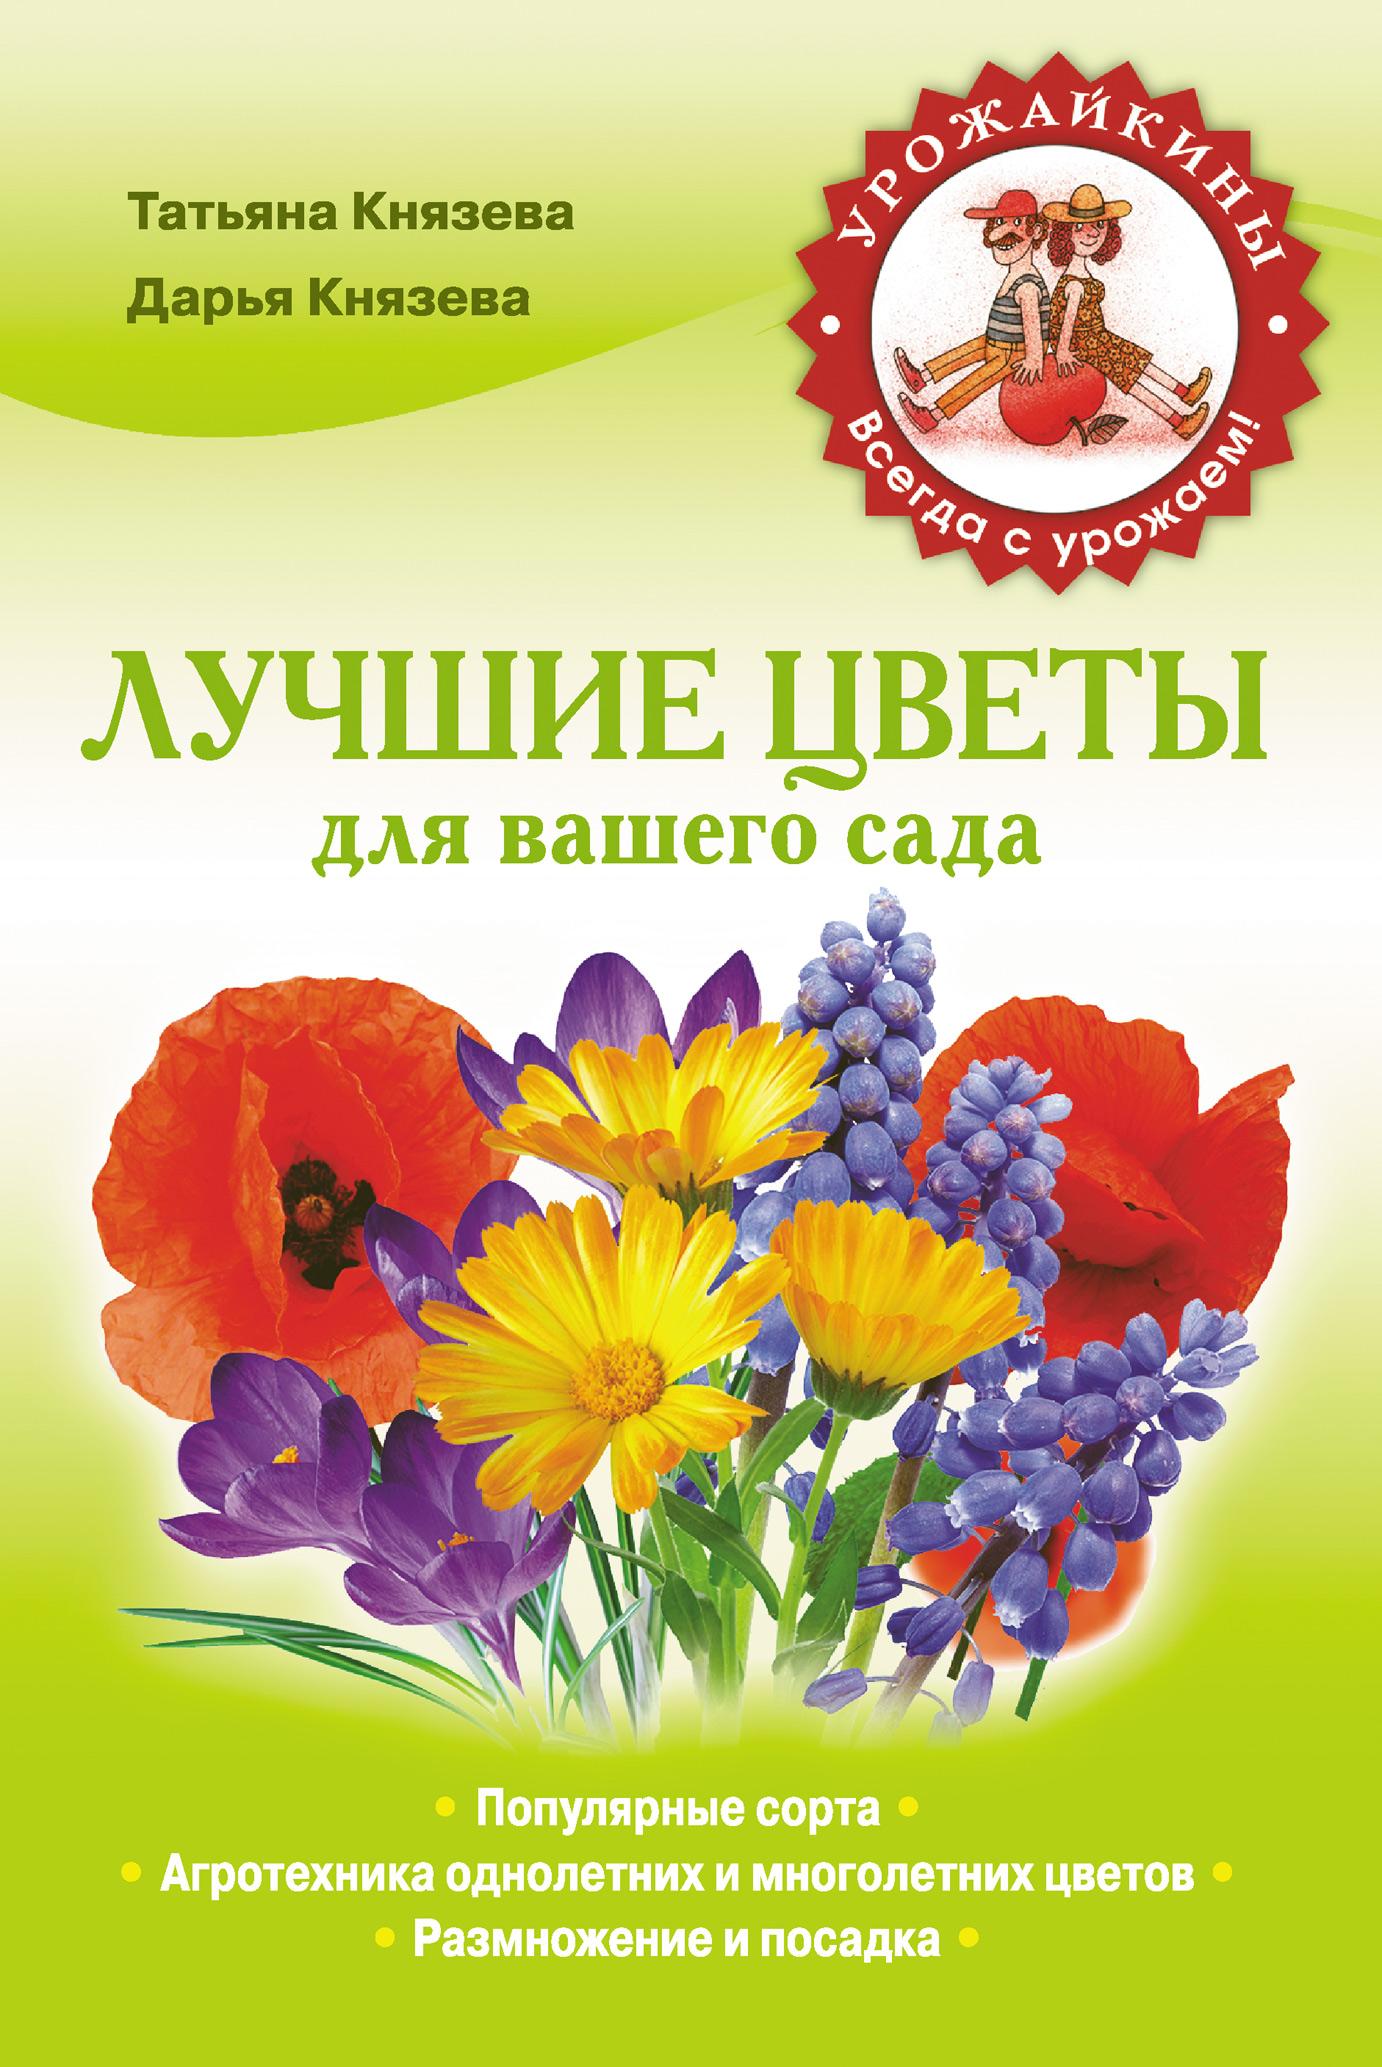 Дарья Князева Лучшие цветы для вашего сада дарья князева лучшие цветы для вашего сада